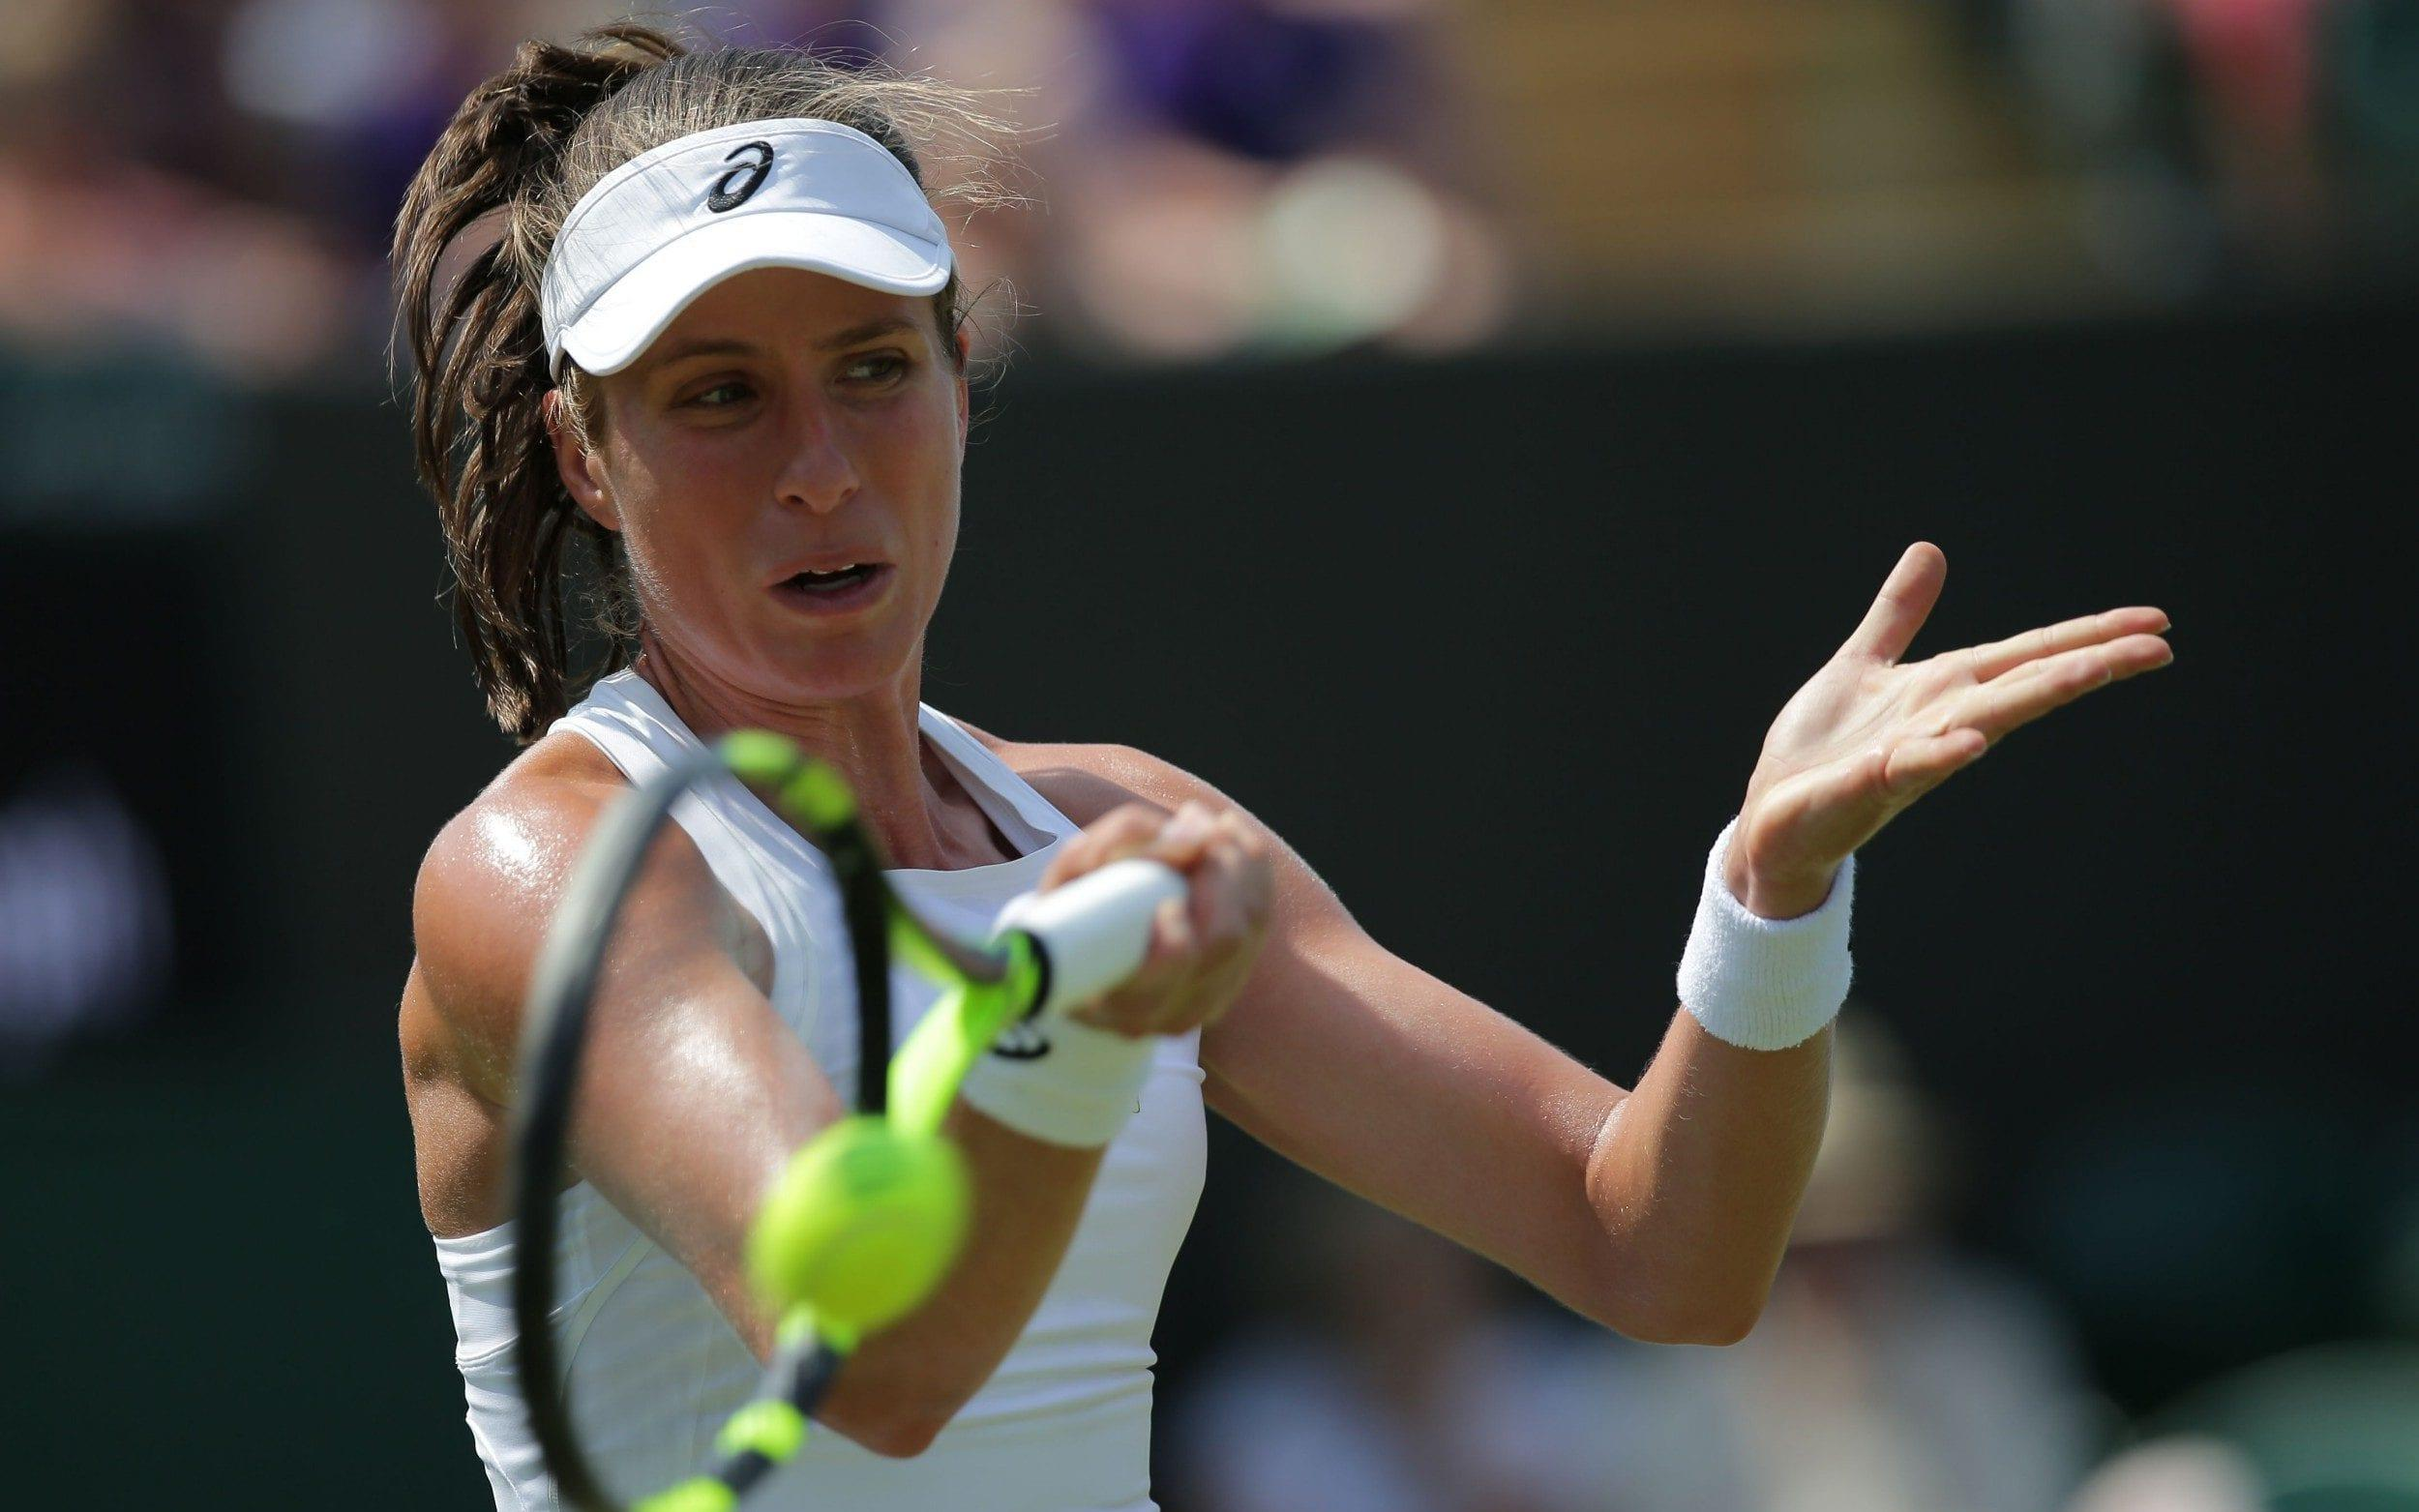 Johanna Konta vs Dominika Cibulkova, Wimbledon 2018: live